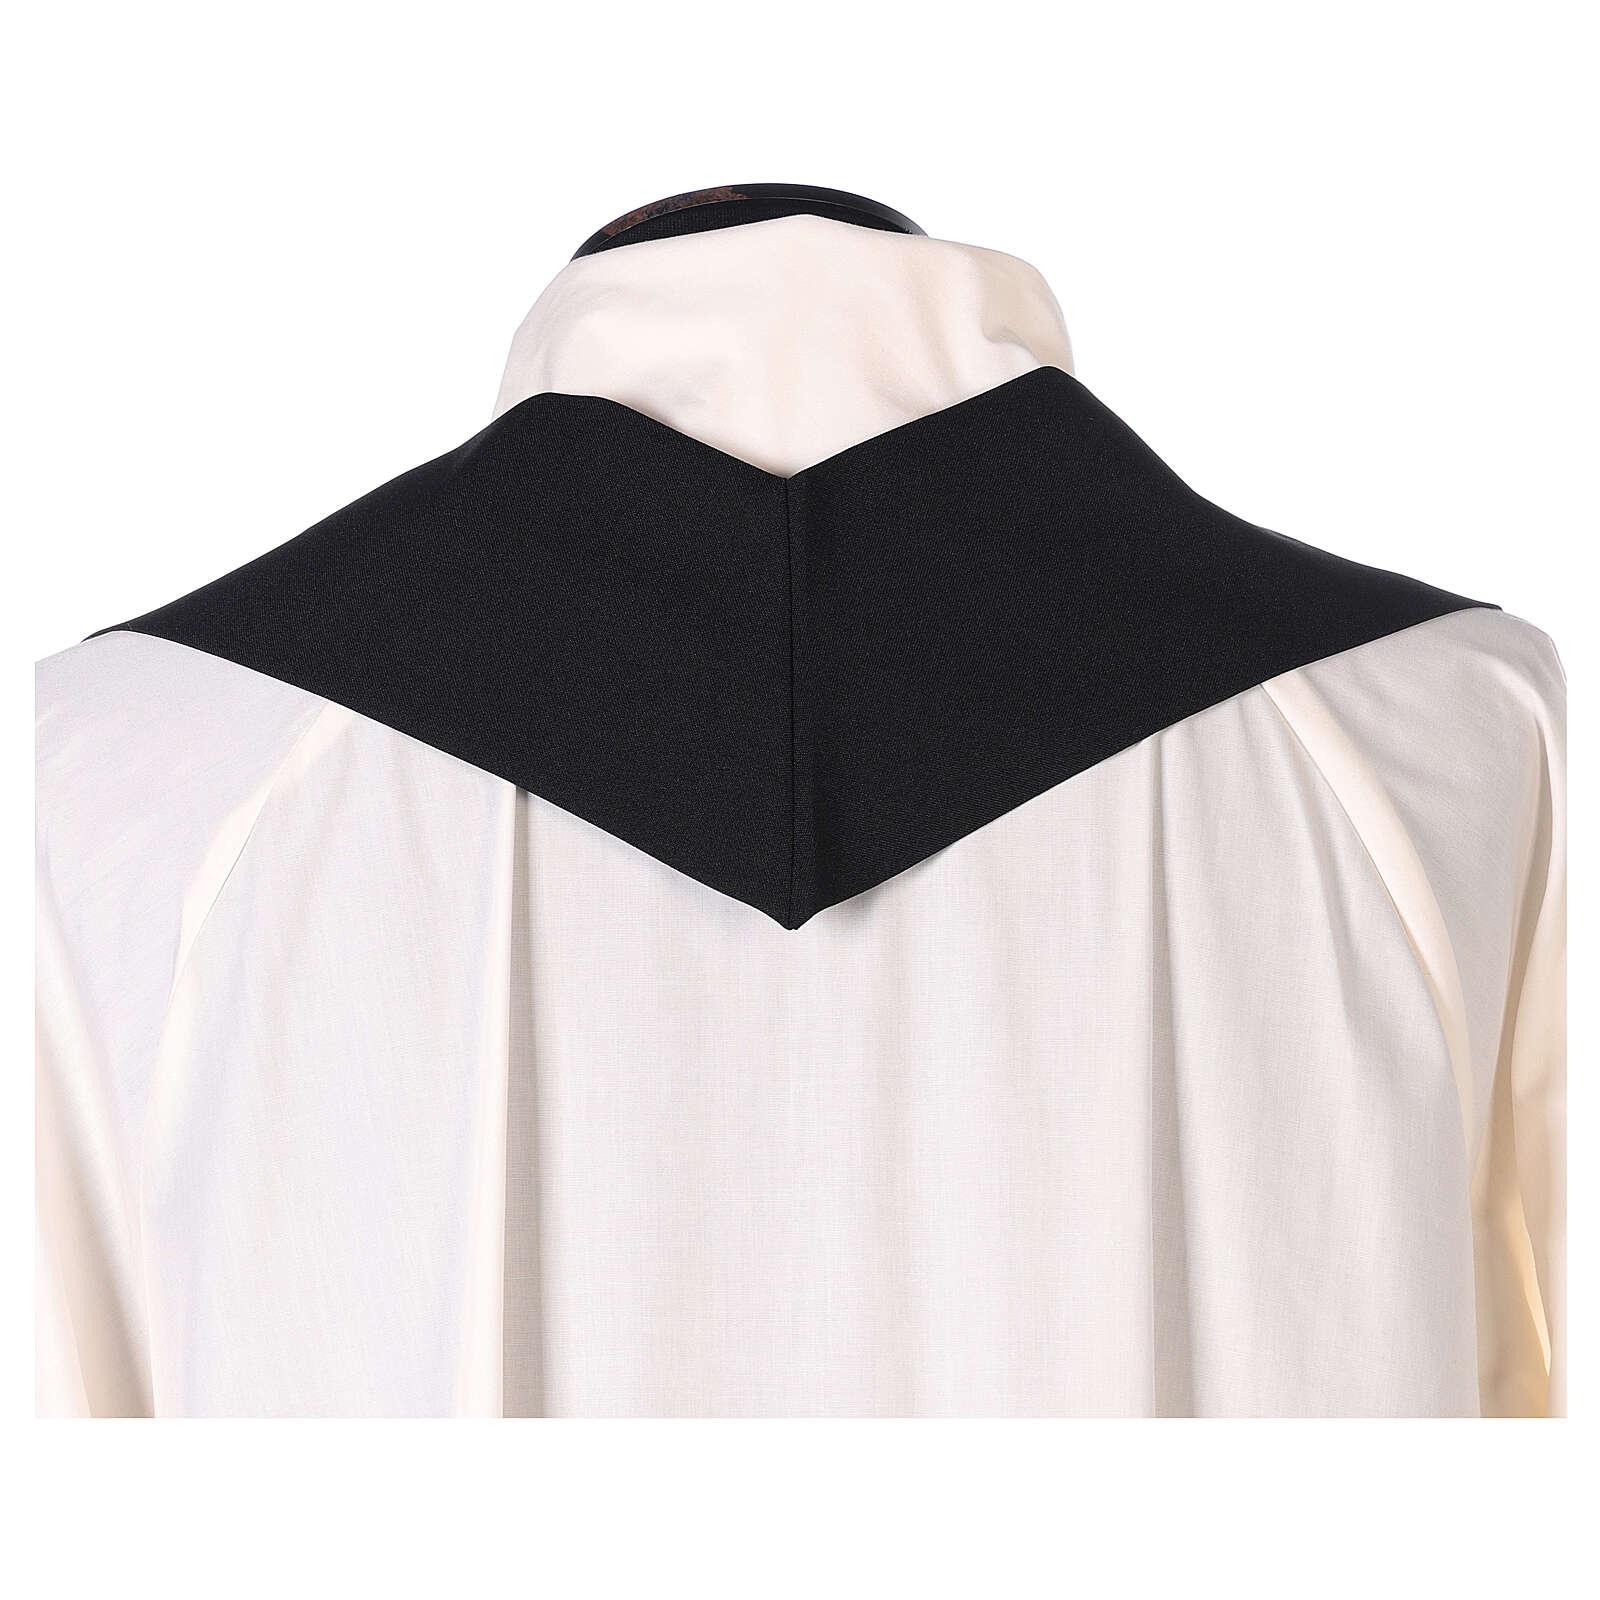 Plain black chasuble, 100% polyester 4